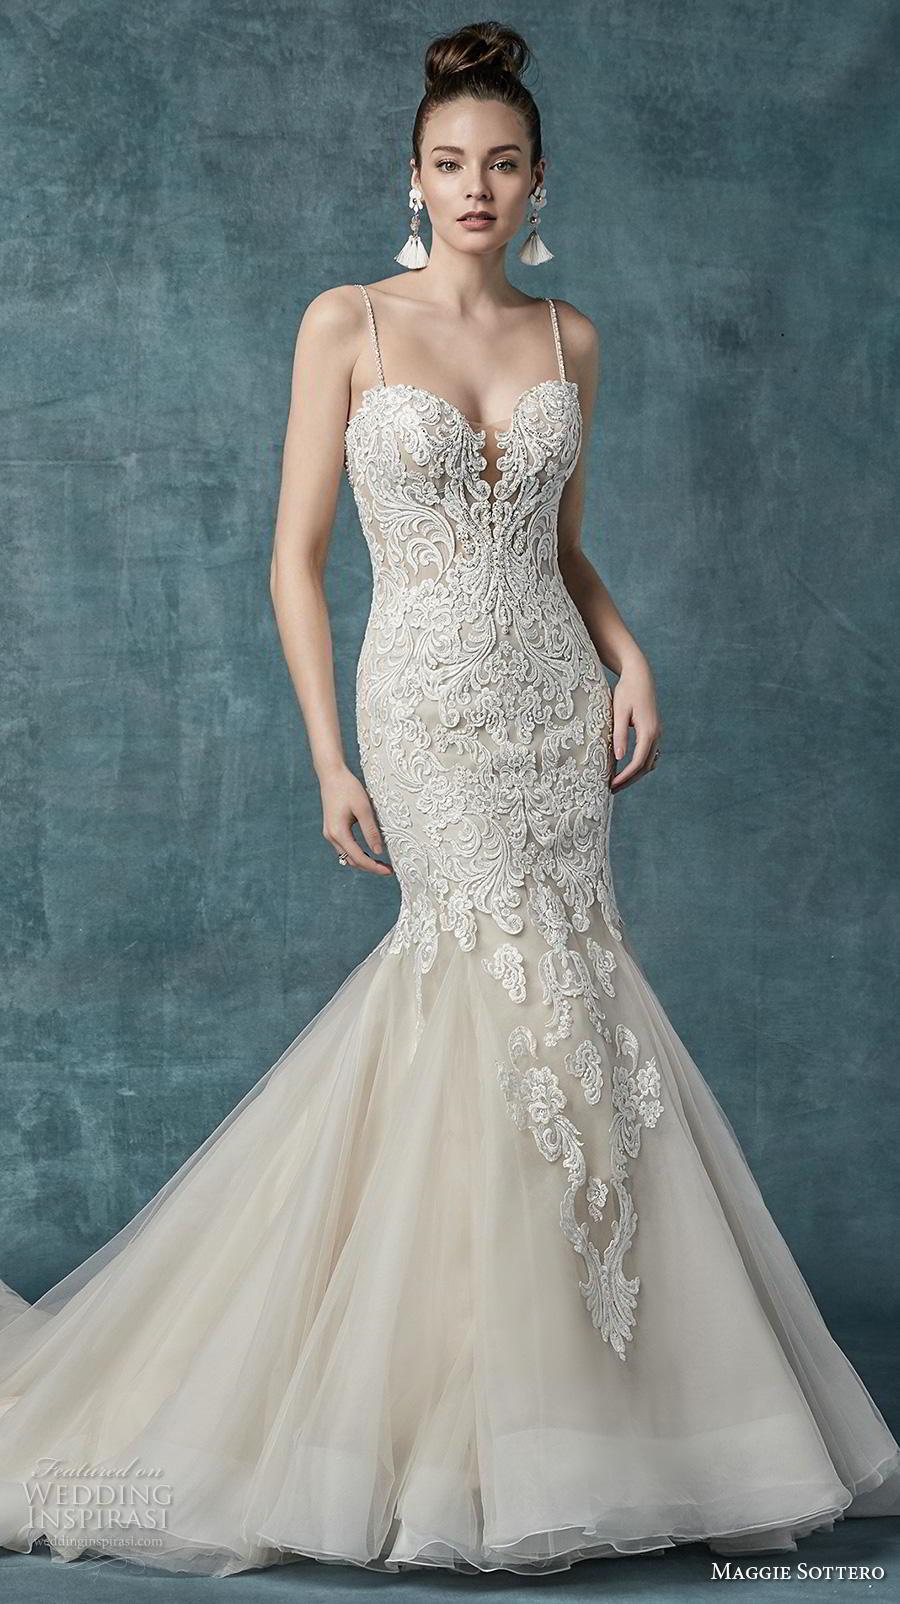 maggie sottero spring 2019 bridal sleeveless spaghetti strap sweetheart neckline heavily embellished bodice elegant mermaid wedding dress mid back chapel train (2) mv